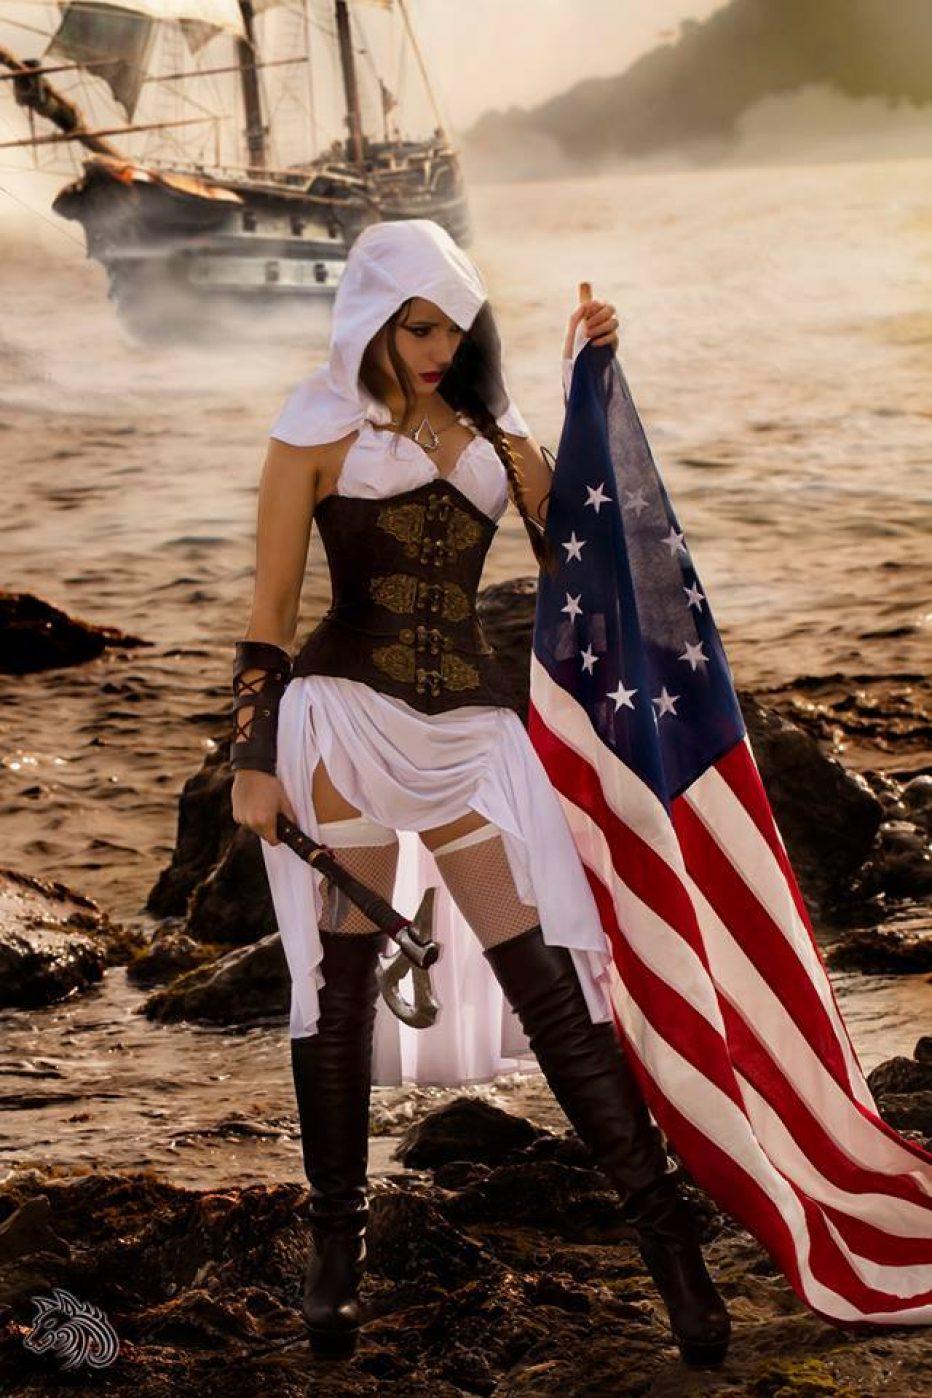 Hasil gambar untuk female assassin creed cosplay